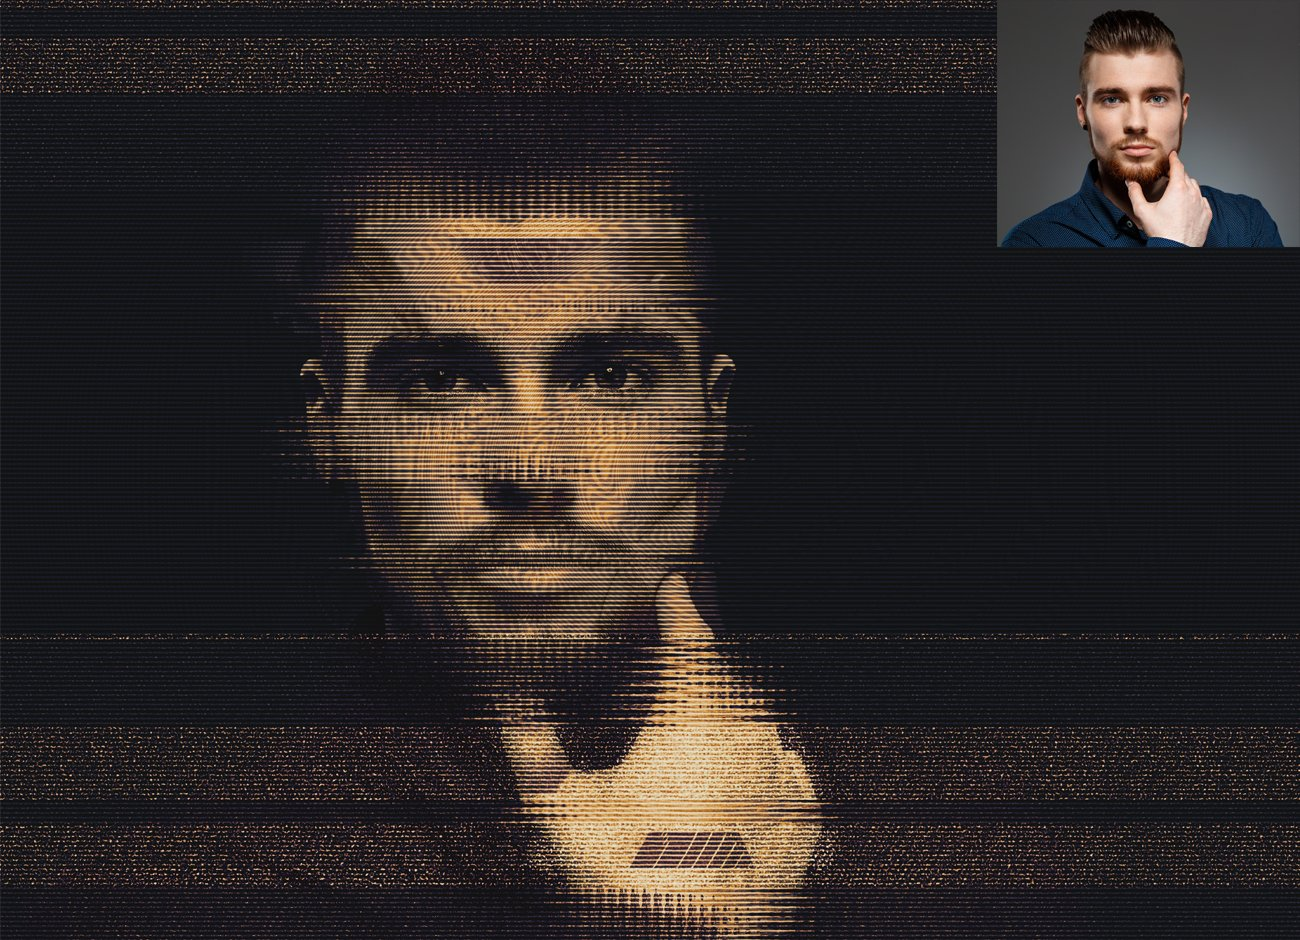 潮流故障风人像照片处理特效PS动作模板 Glitch Portrait Effect PS Action插图3